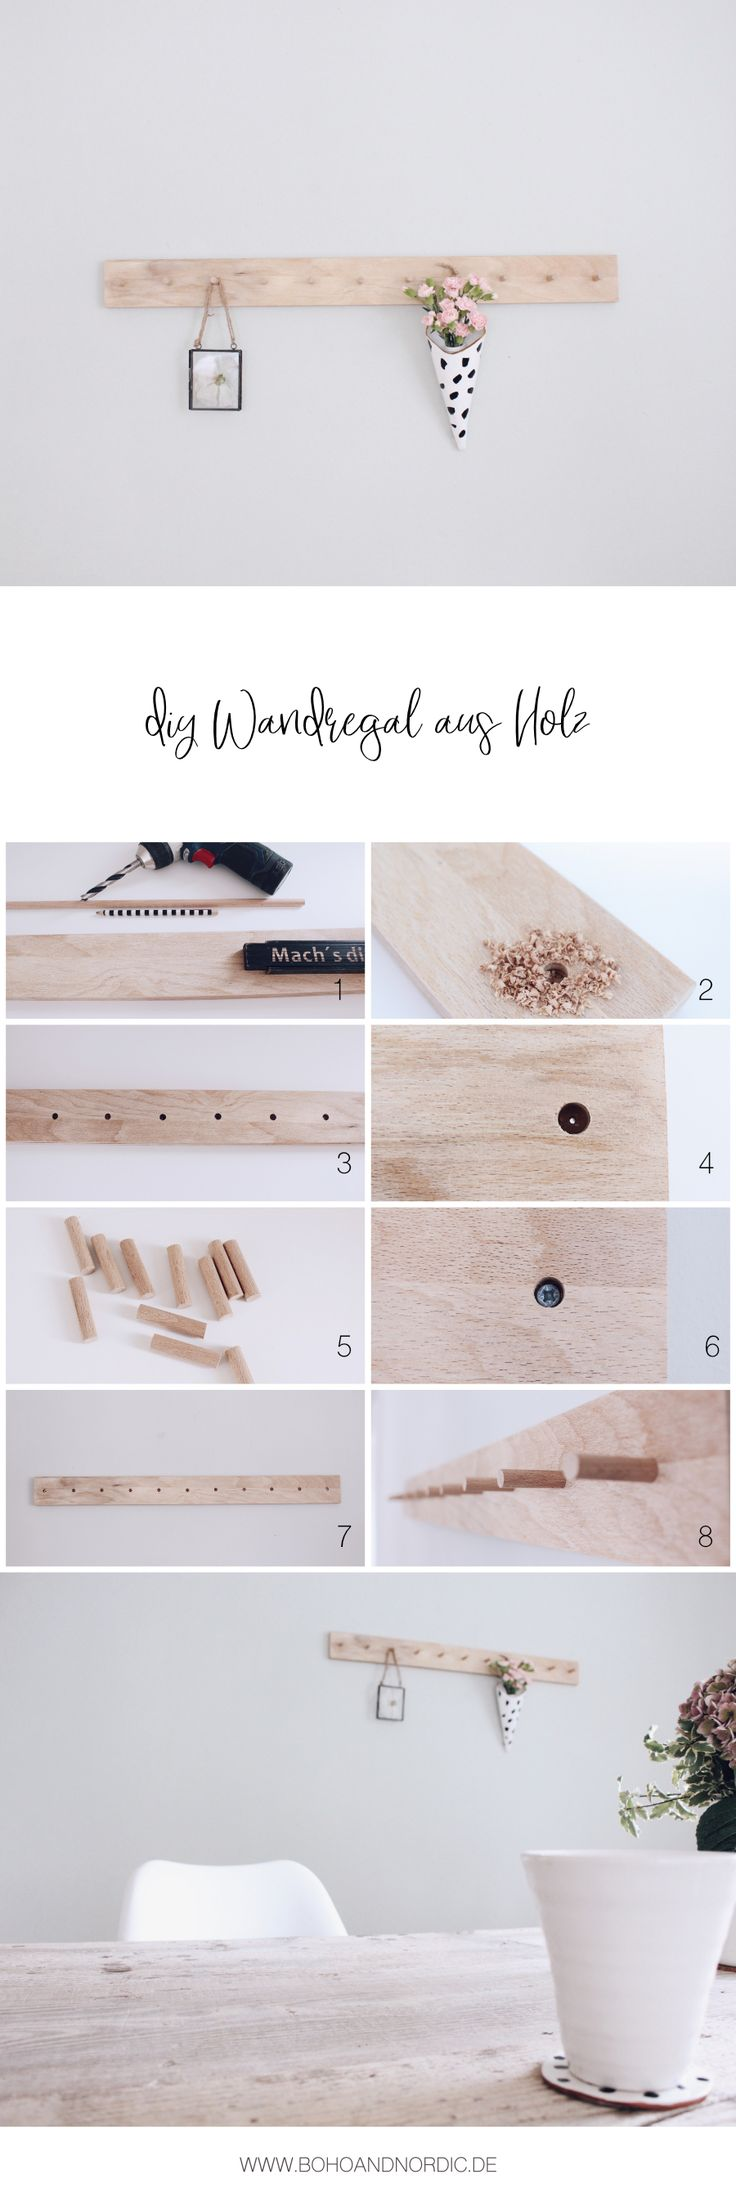 DIY Wandregal aus Holz selber machen